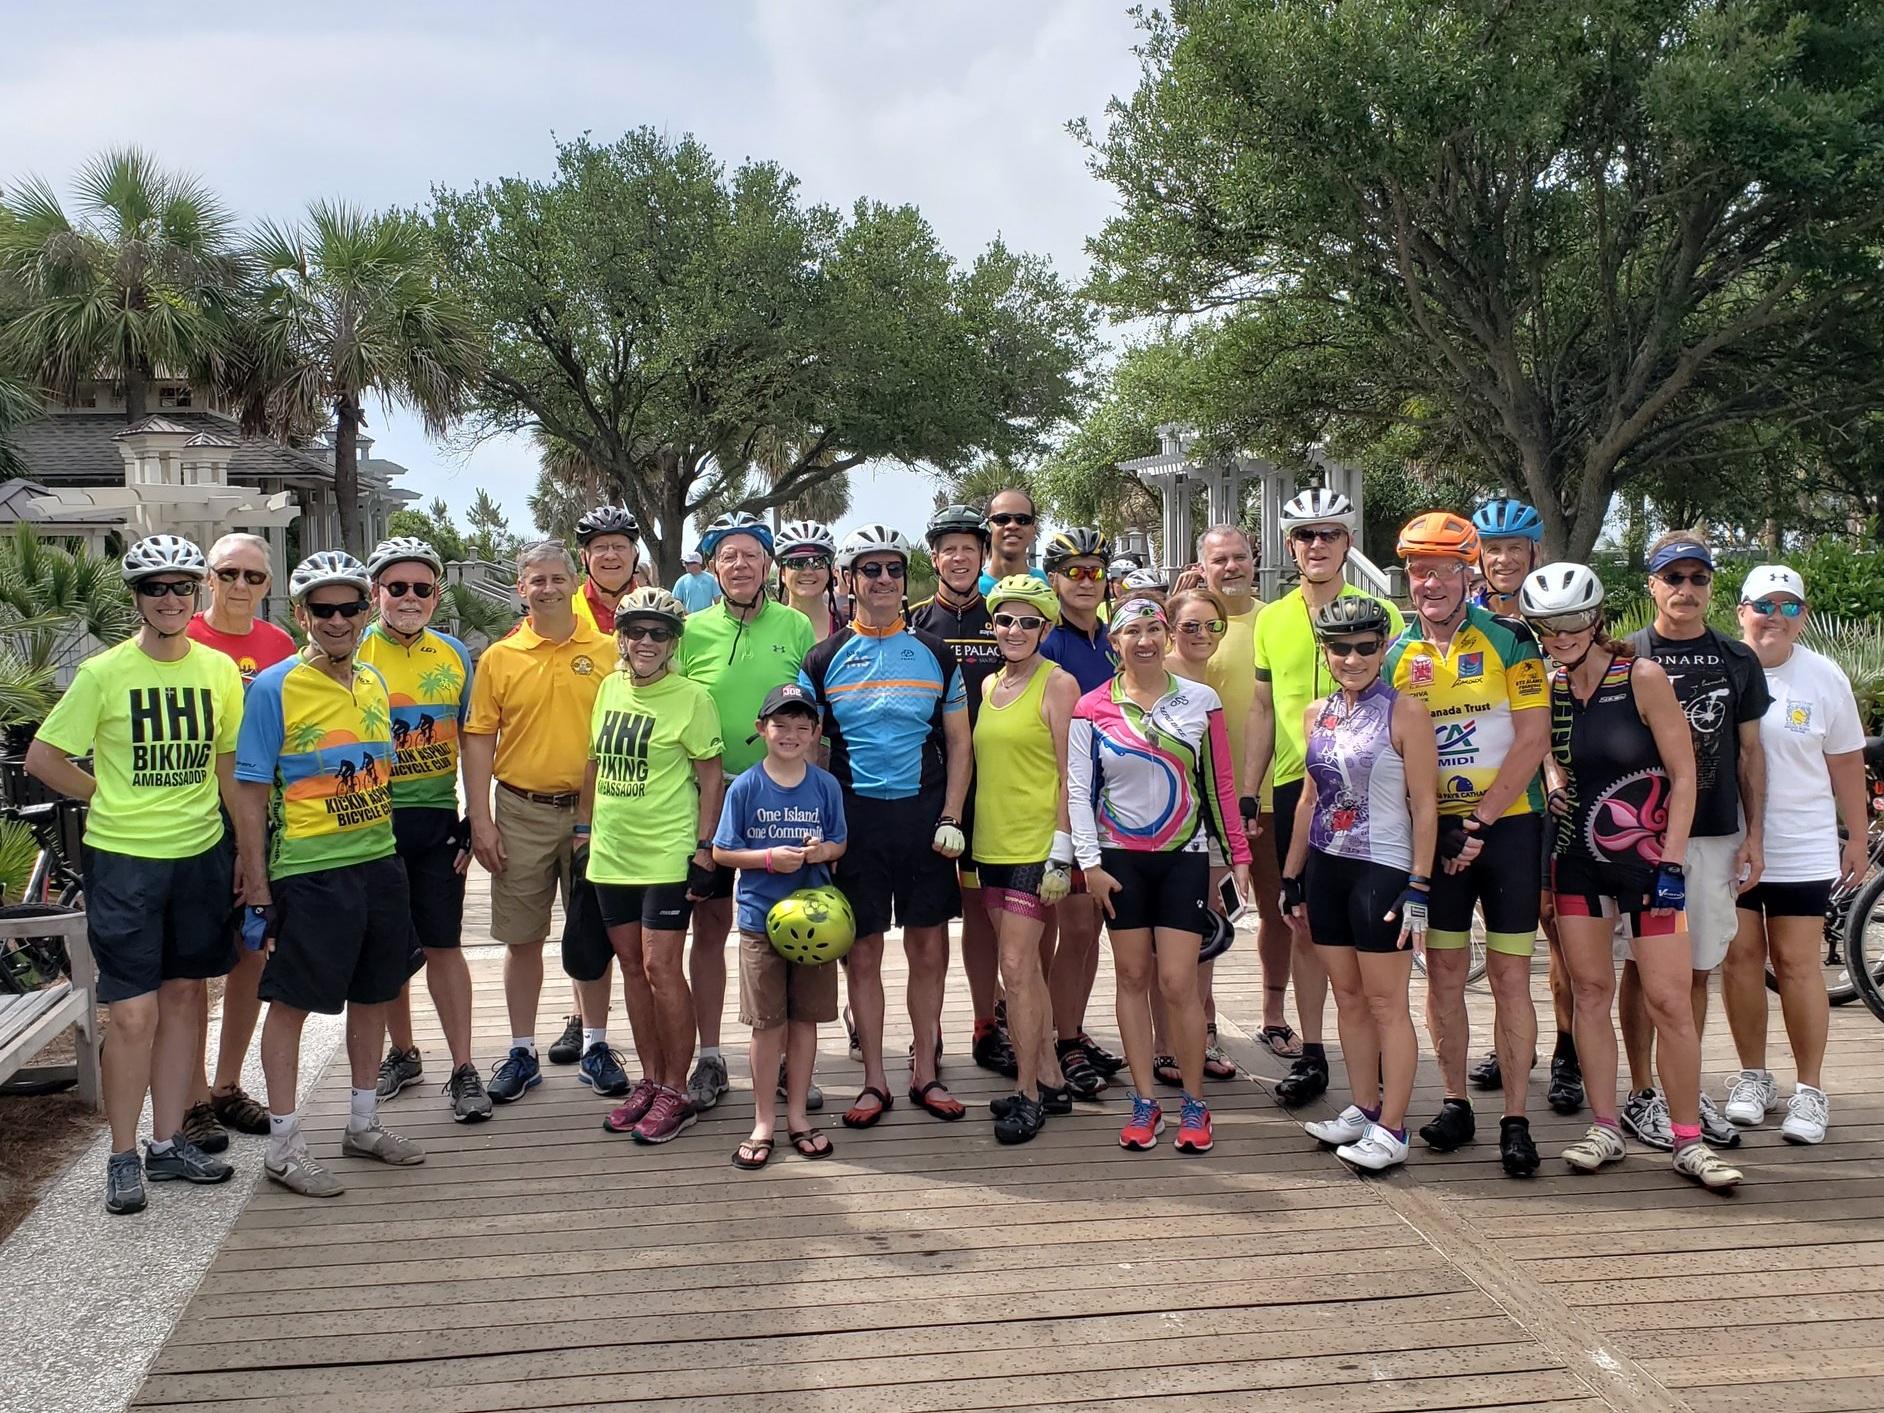 Celebrating National Bike Month with a Community Beach Bike Ride.